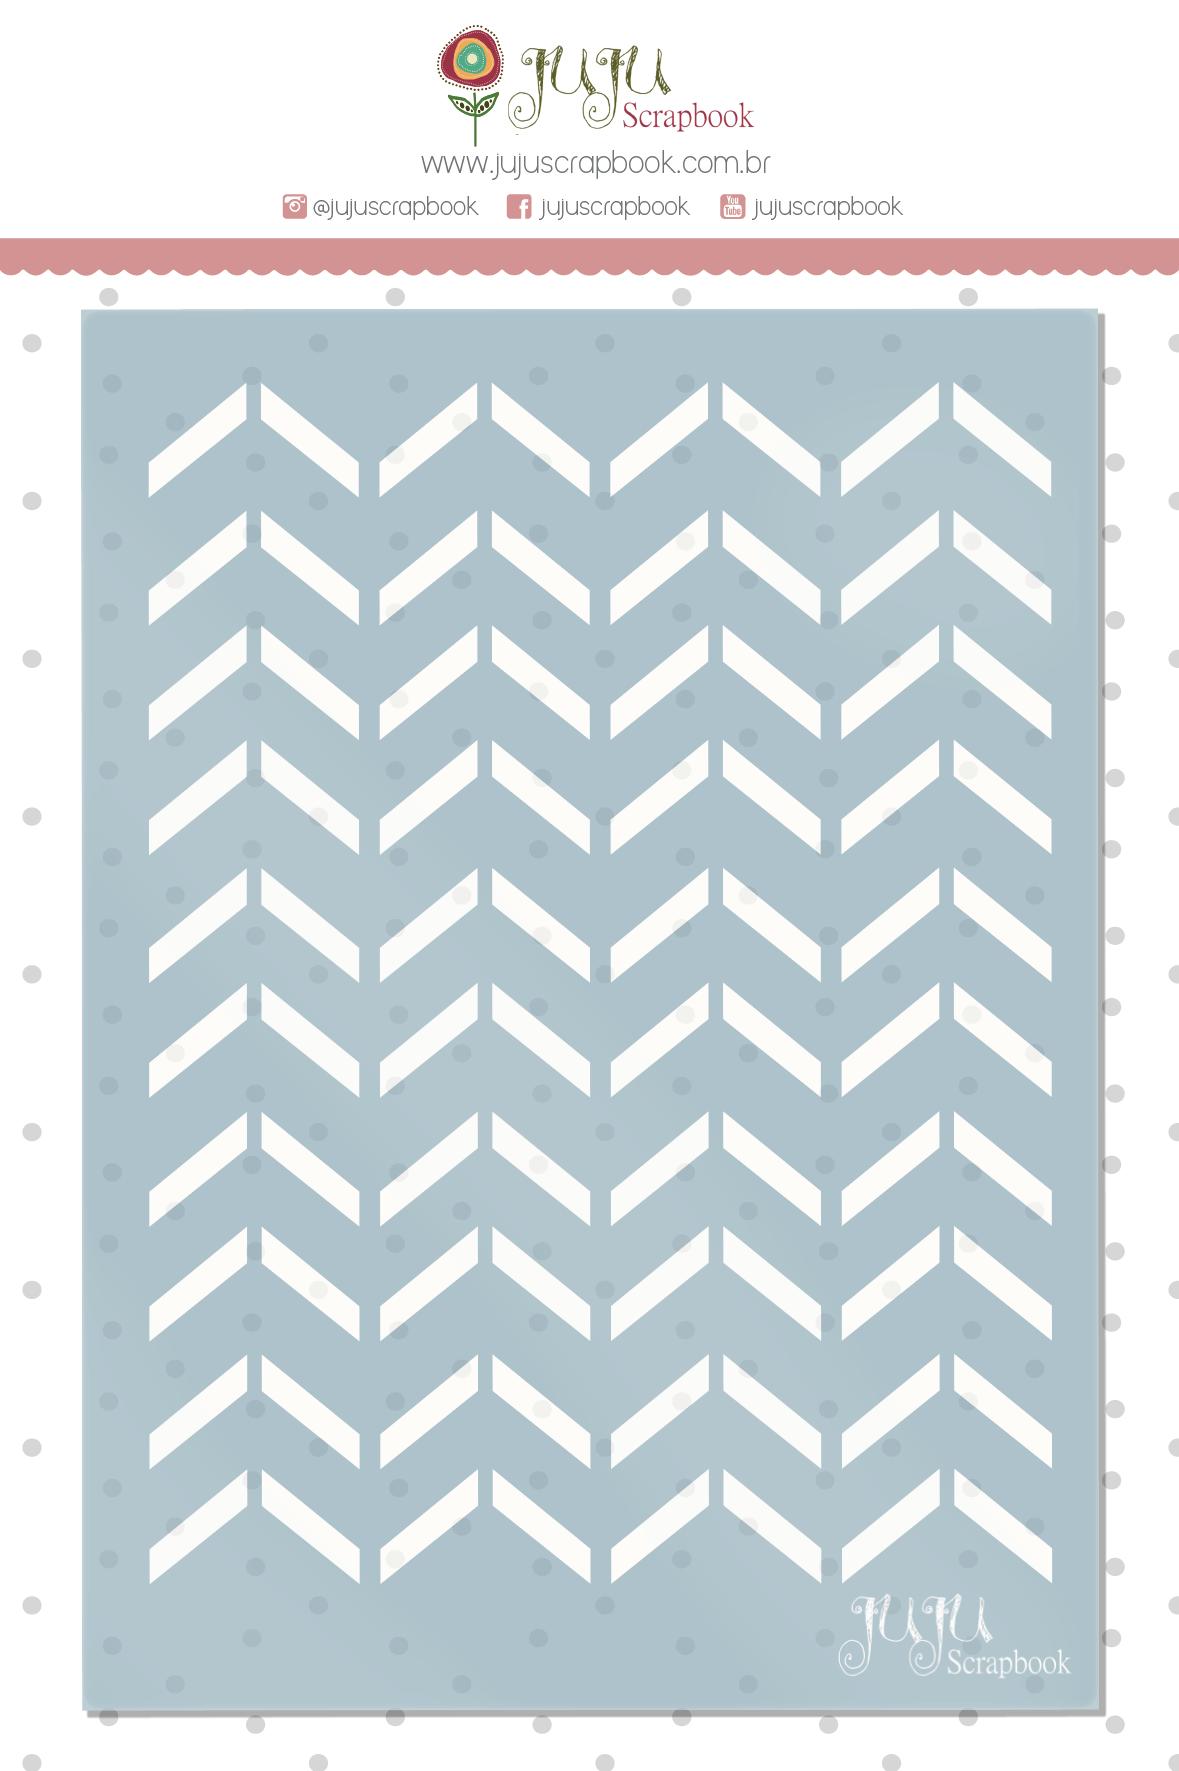 Stencil Chevron Geométrico - Coleção Quarentena Criativa - Juju Scrapbook  - JuJu Scrapbook